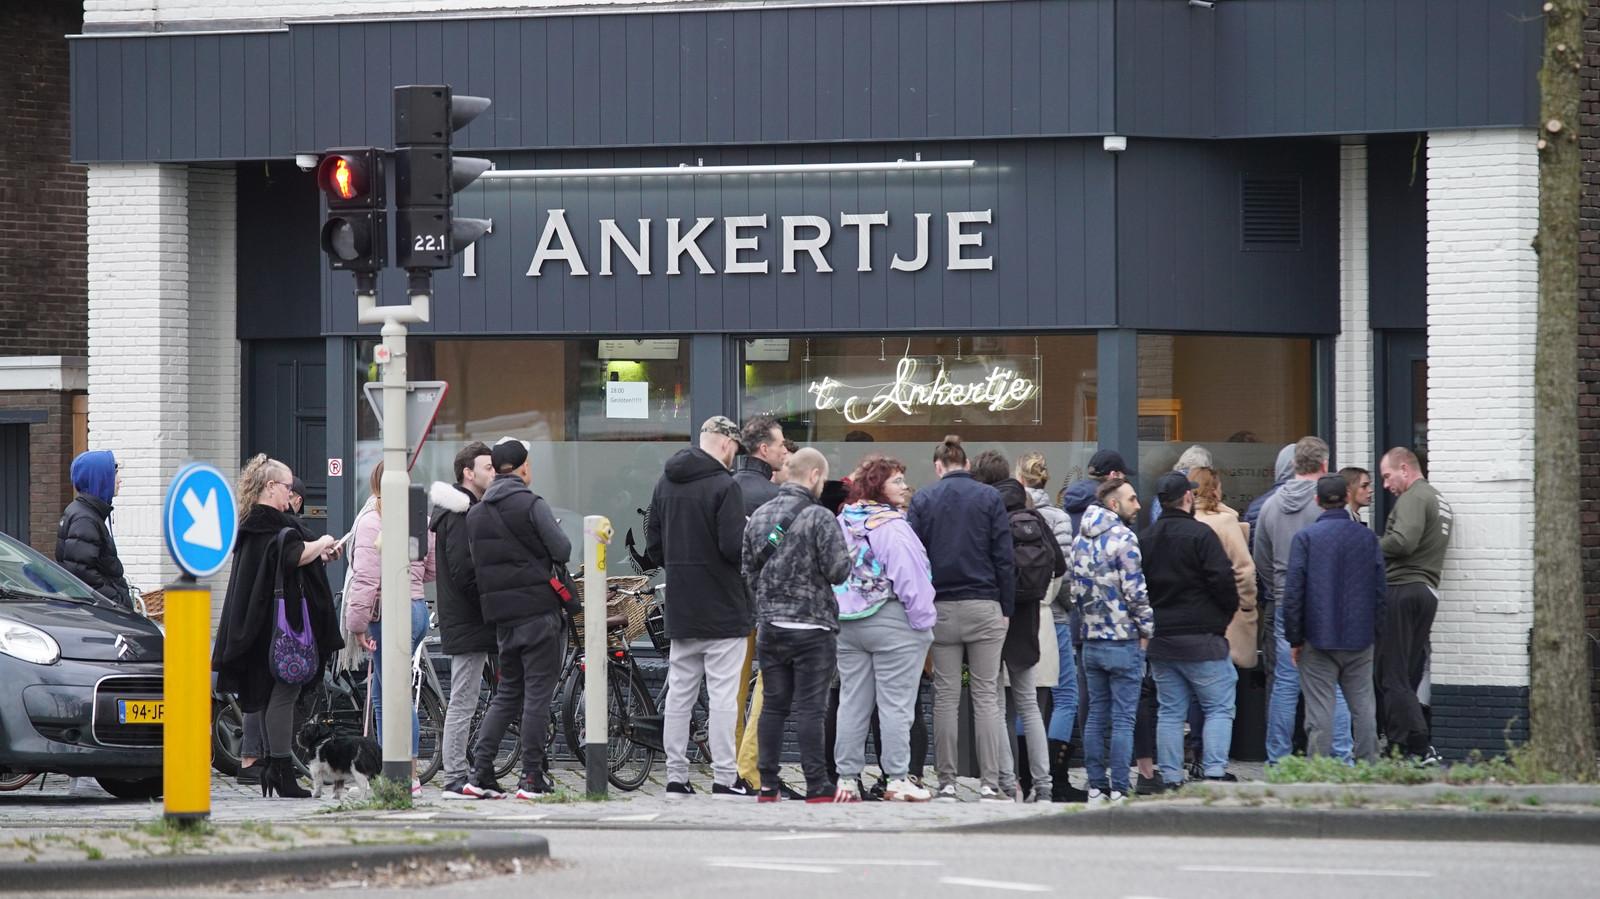 Drukte bij coffeeshop 't Ankertje in Deventer.